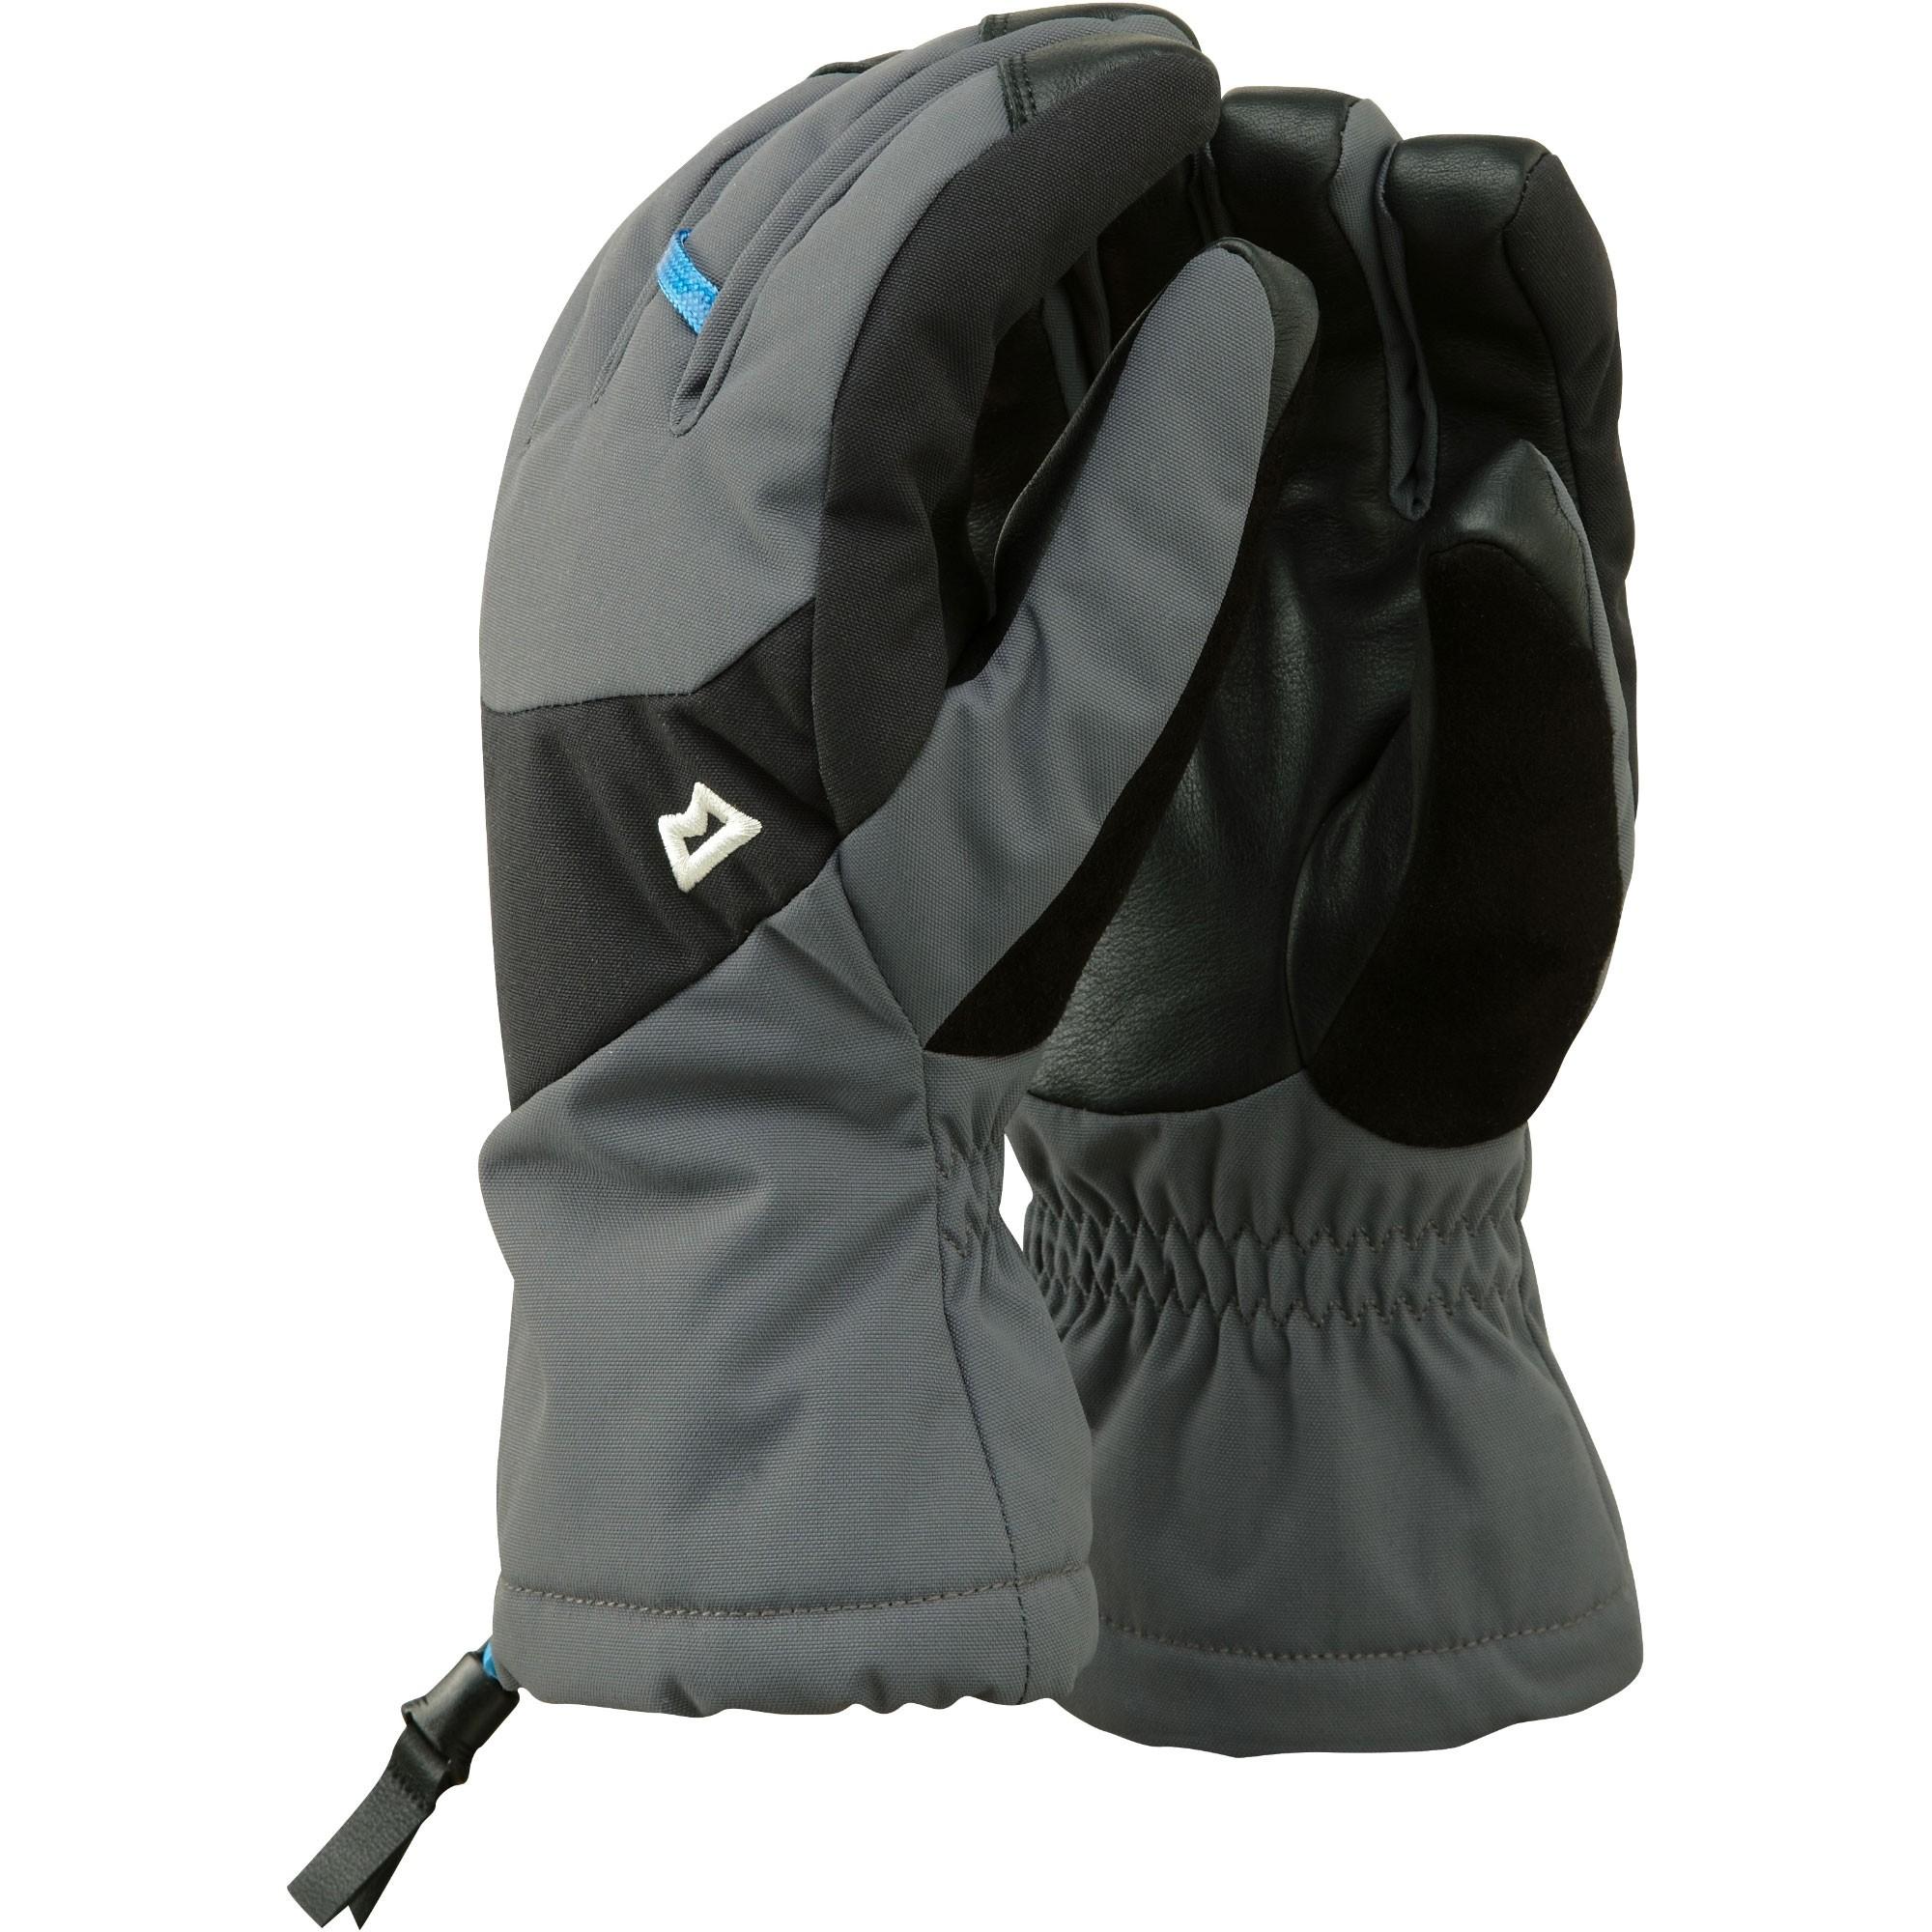 Mountain Equipment Guide Women's Gloves - Shadow Grey/Black